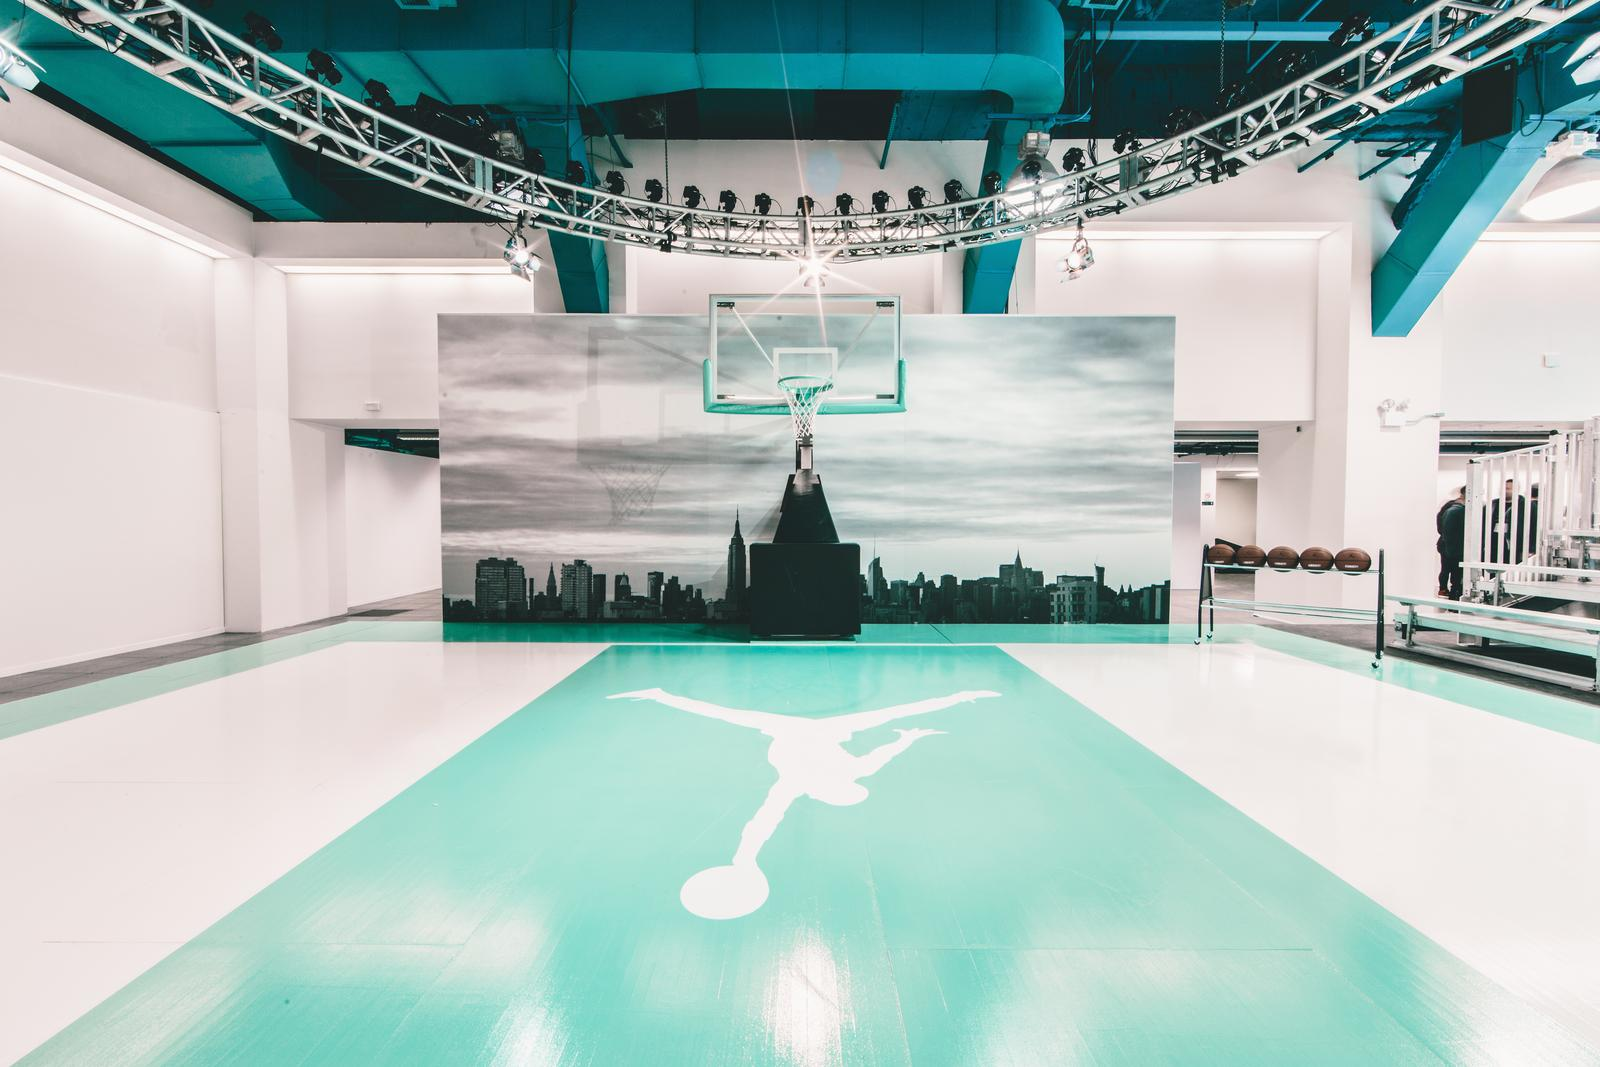 Jordan Brand's Pearl Pavilion: Skills Training